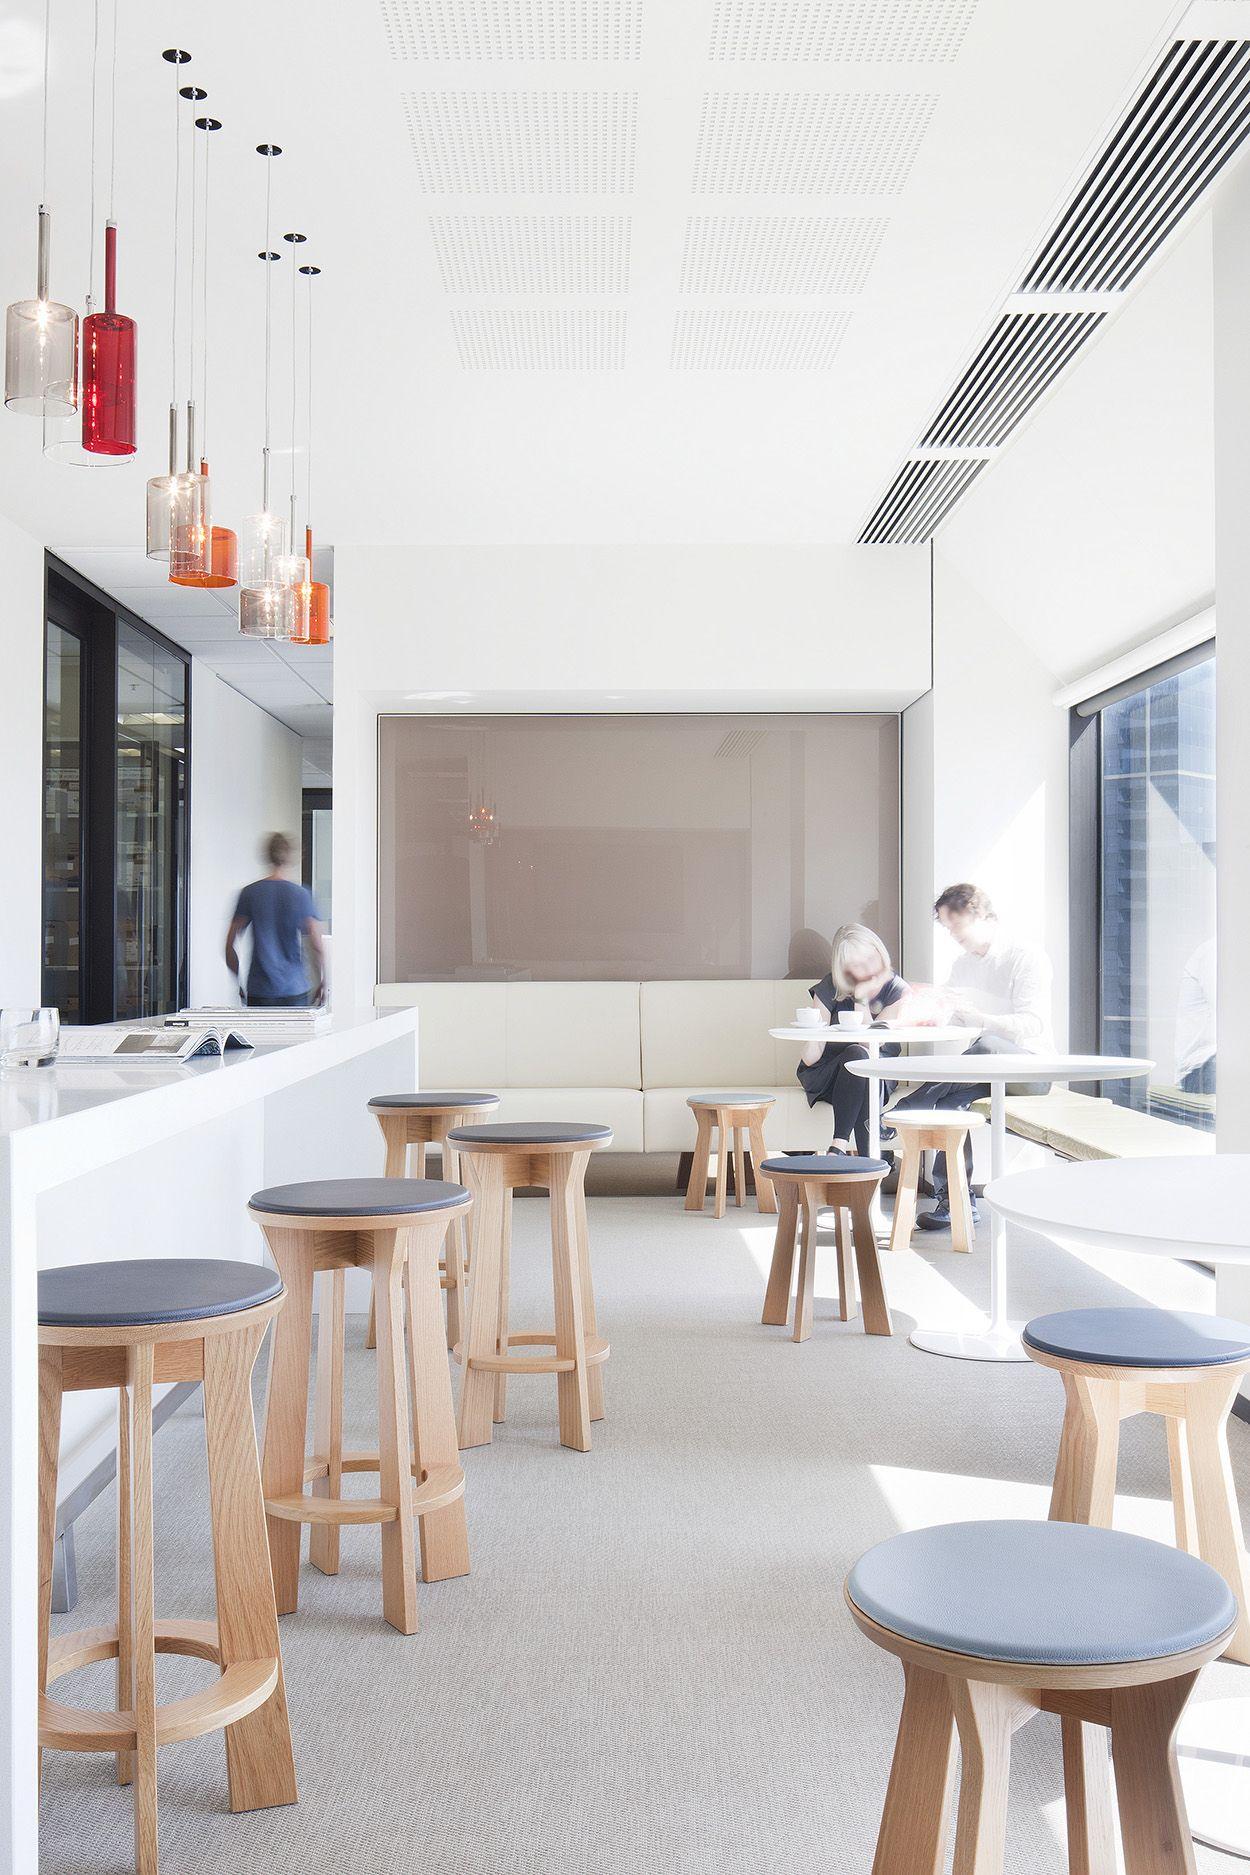 World Best Interior Designer Featuring Batessmarts For More Inspiration See Also